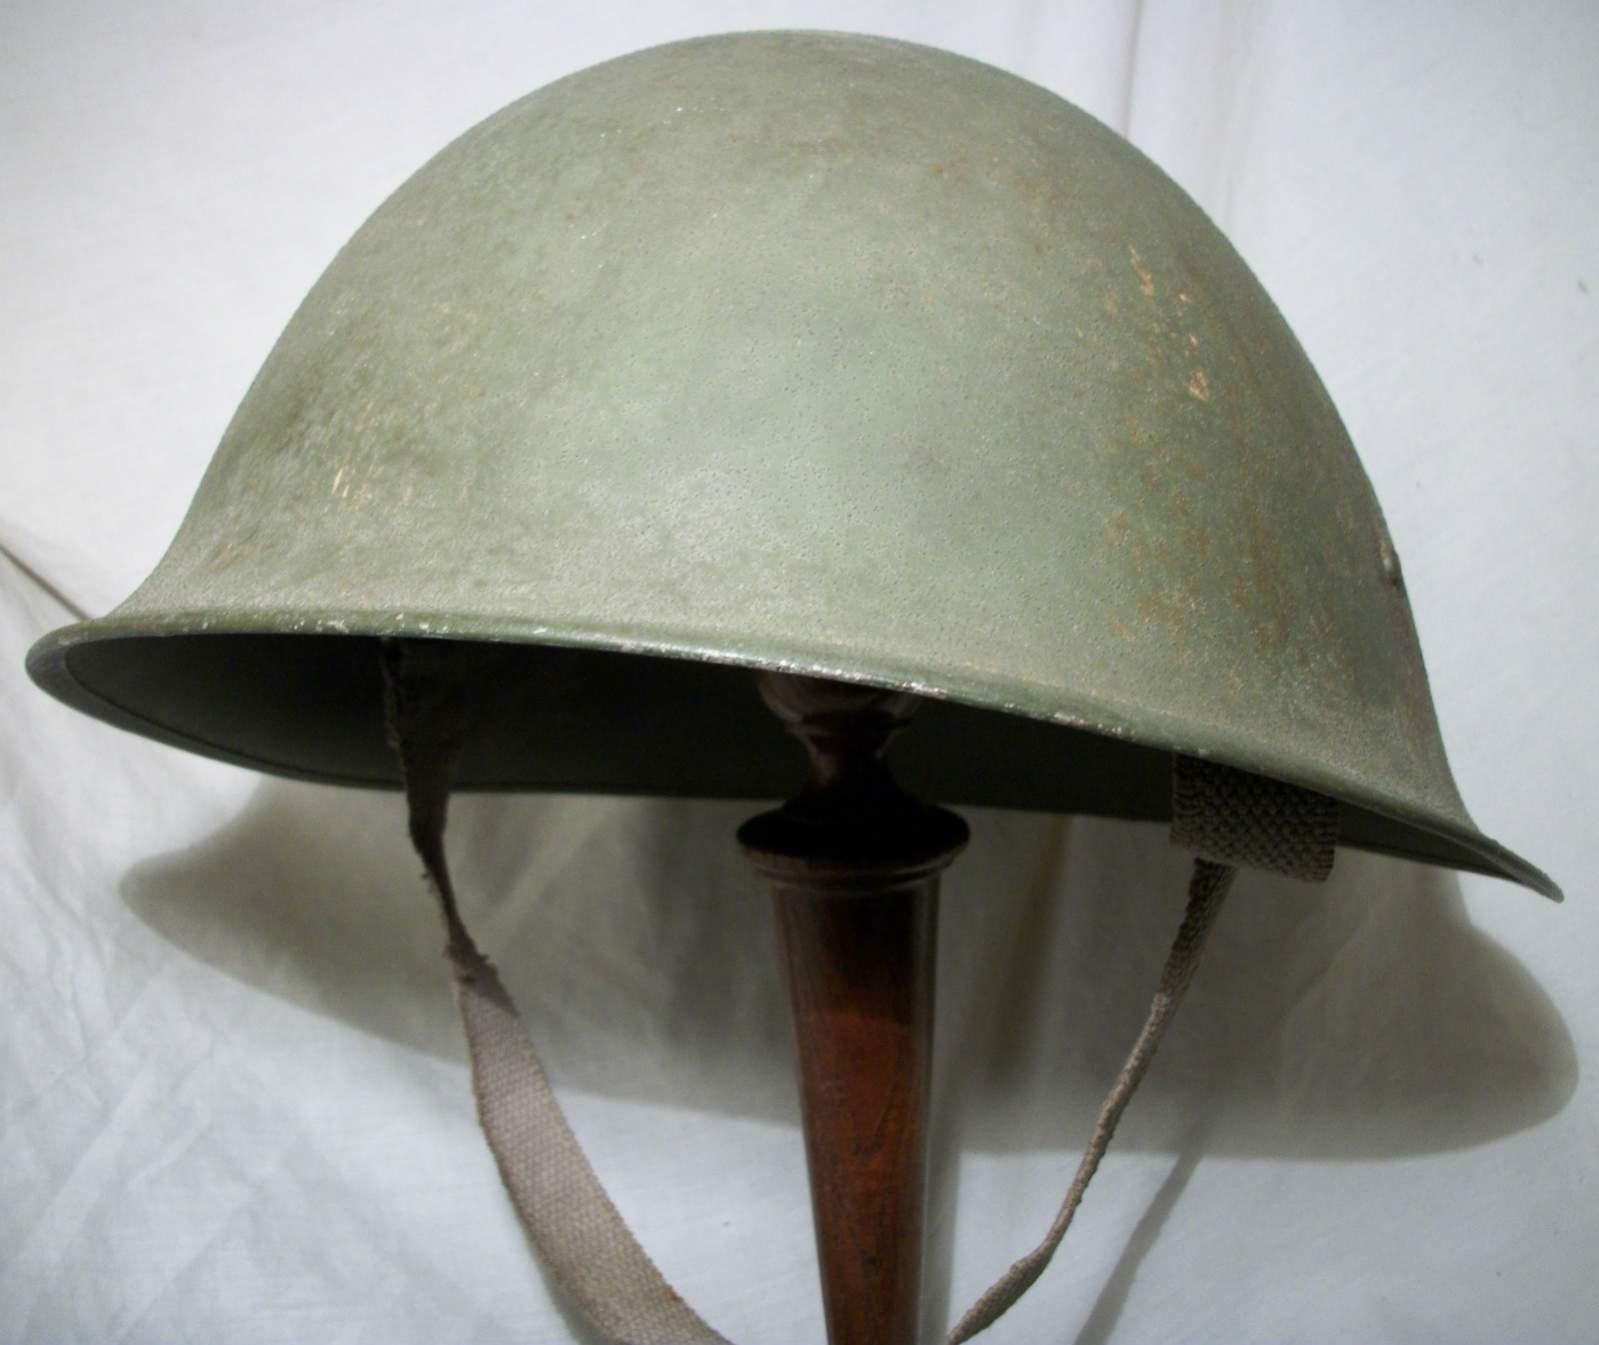 British Mkiii Turtle Pattern Helmet Page 7